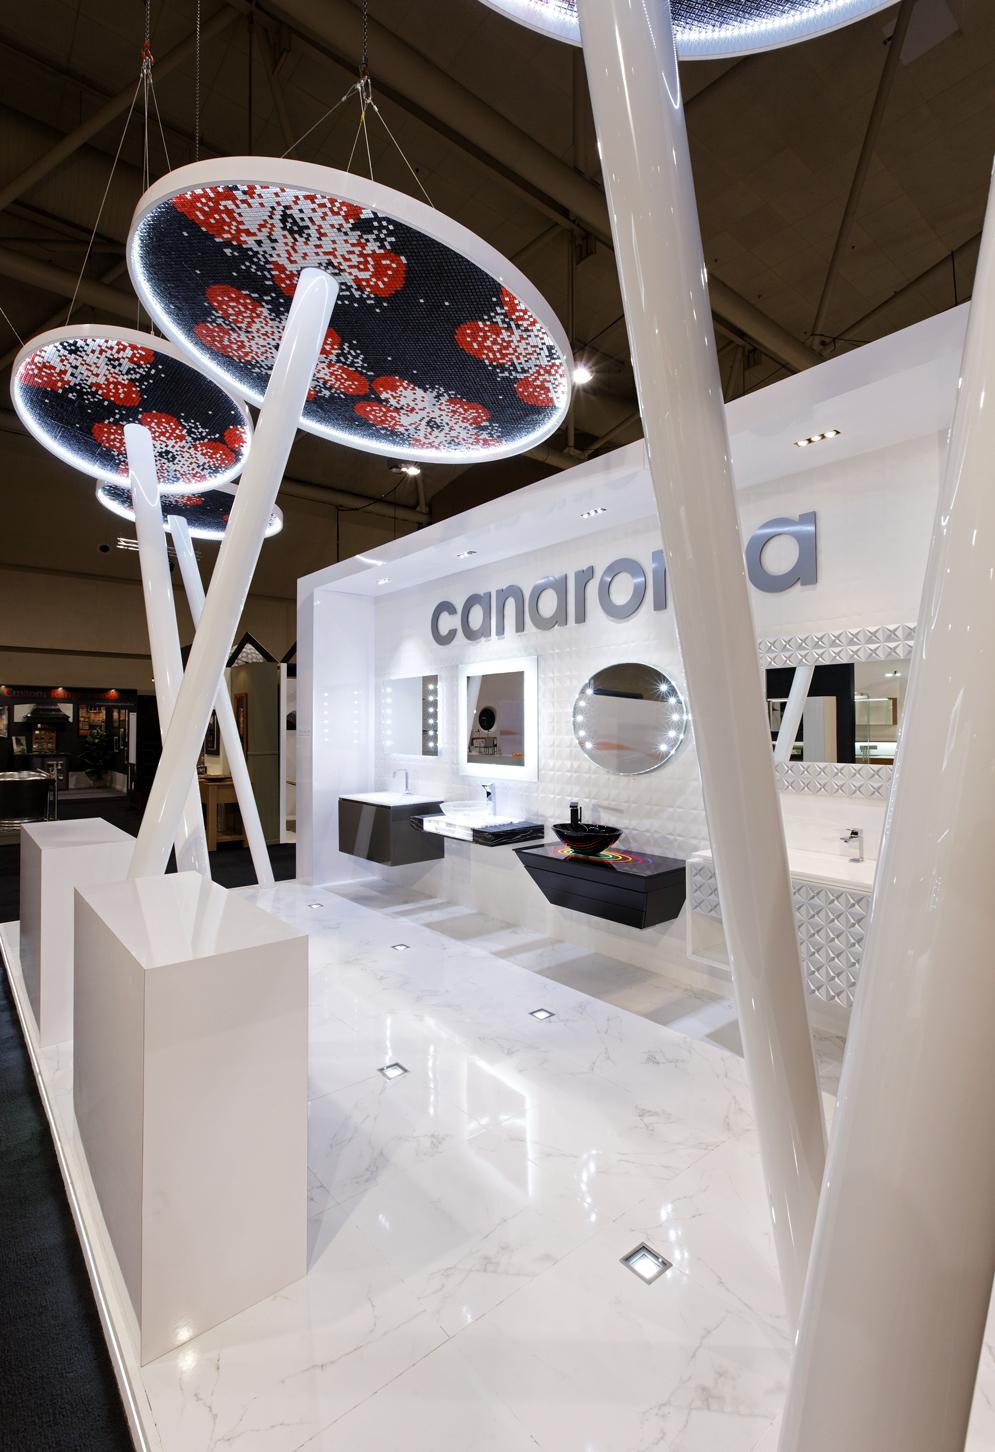 Canaroma Booth3.jpg